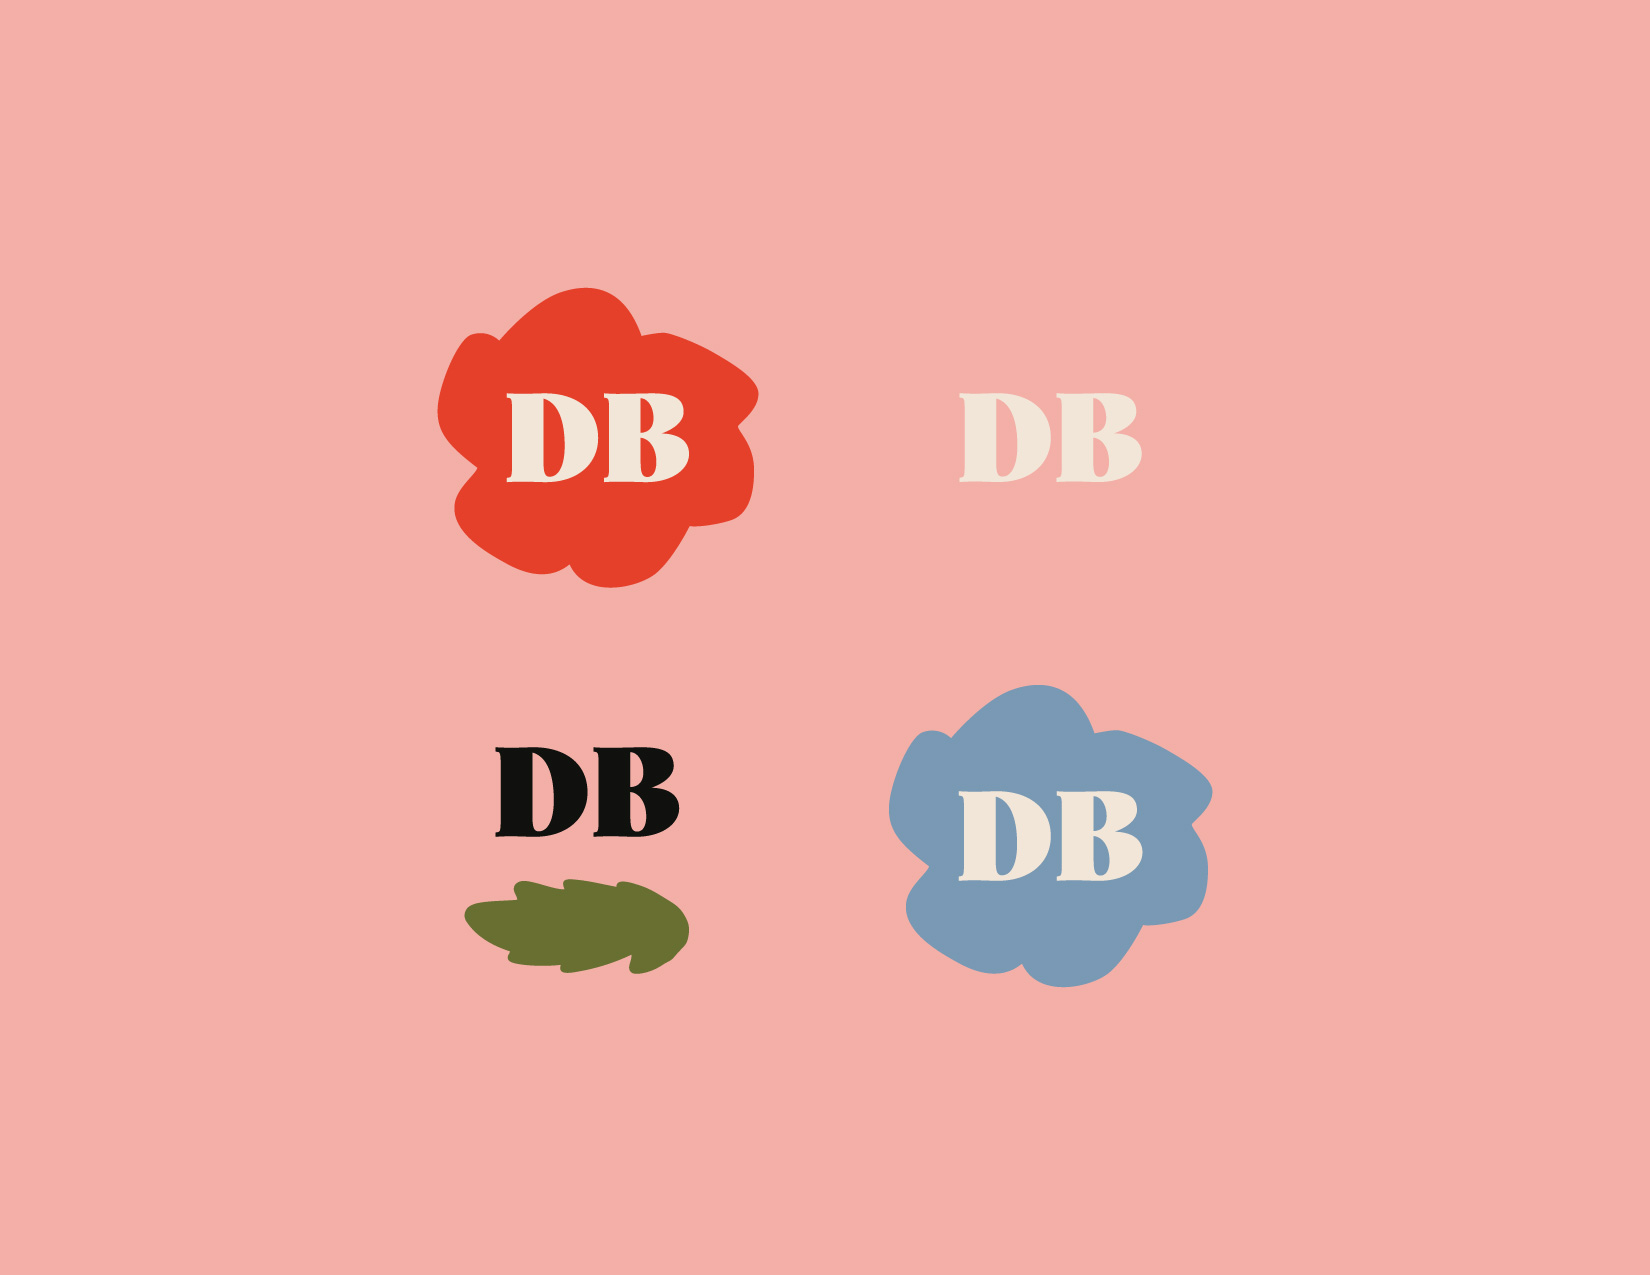 db_flowers_board_04-01.jpg